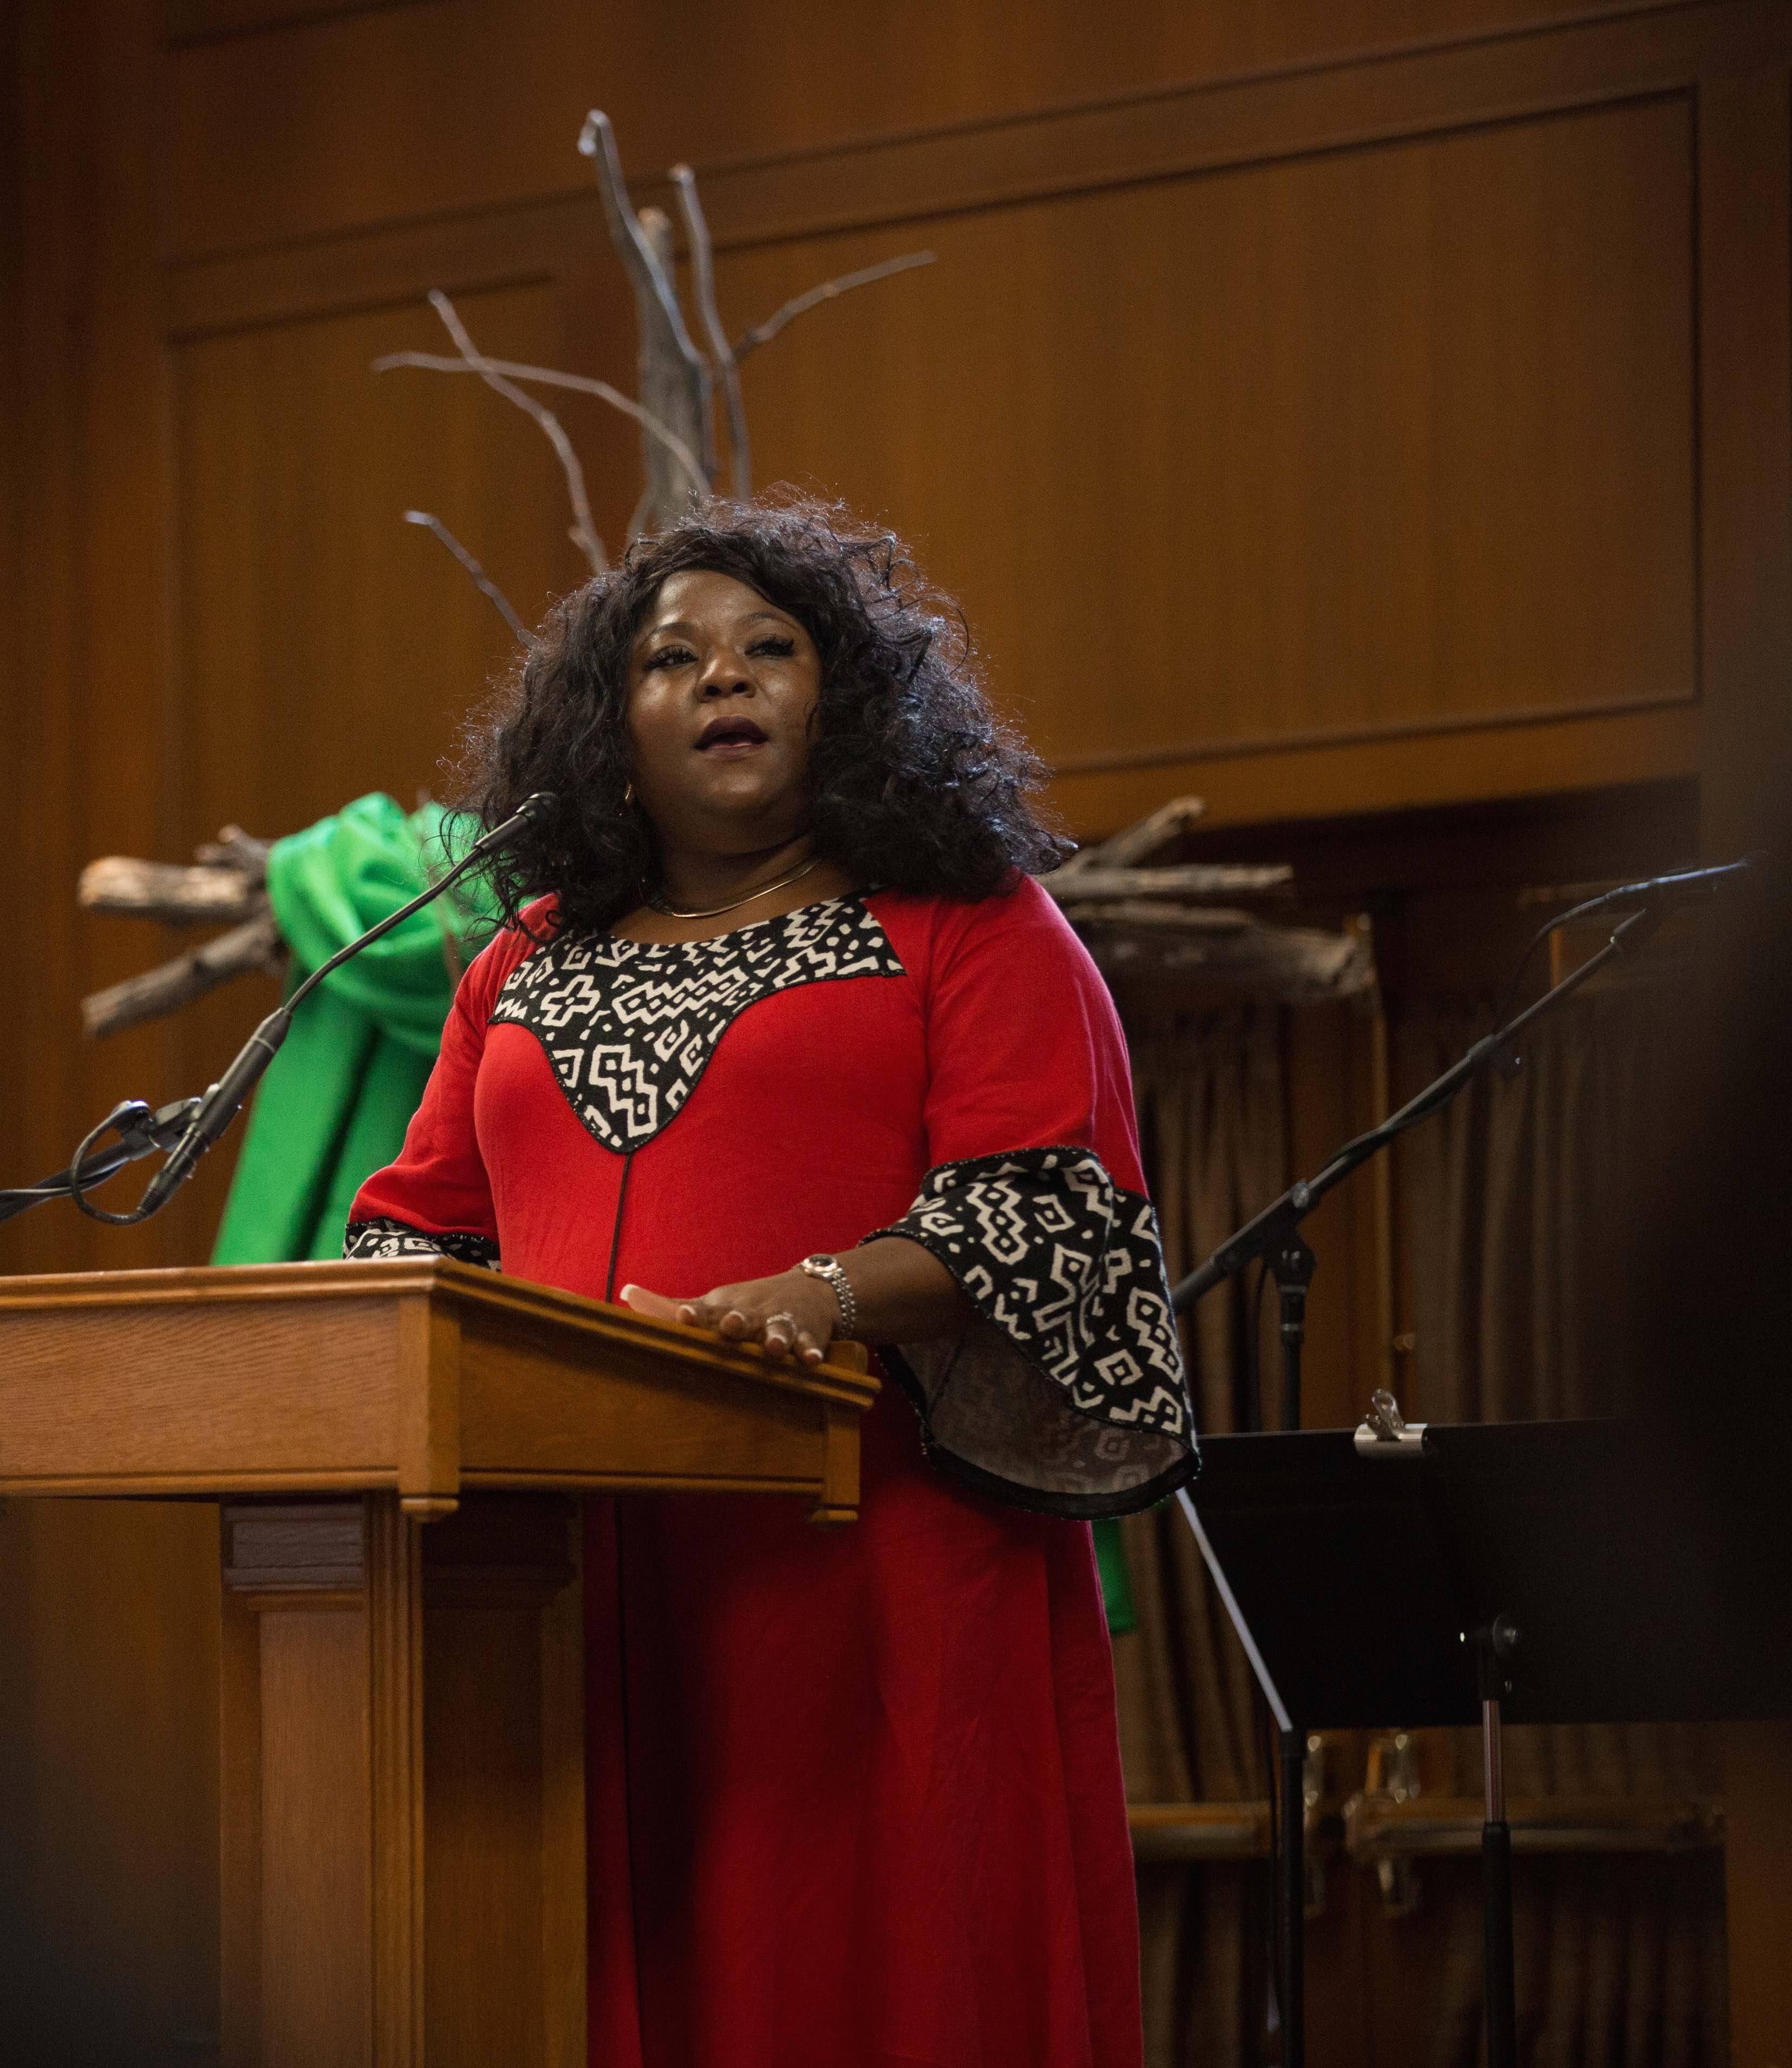 Stacy Floyd Thomas Black Lives Matter at Fuller Seminary